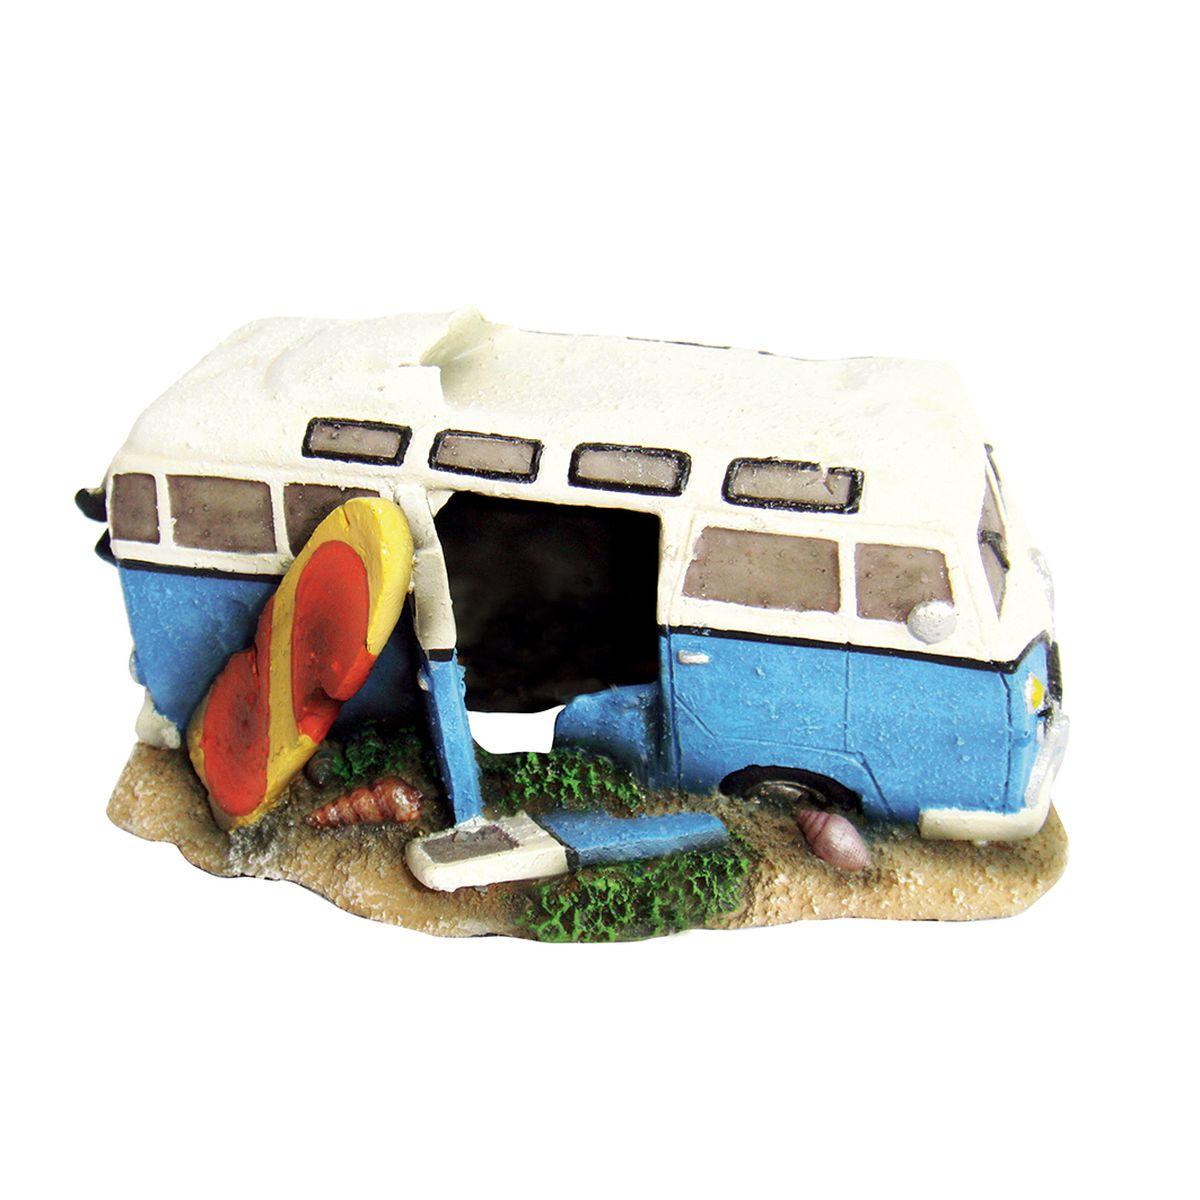 Декорация для аквариума ArtUniq Автобус незадачливых серферов, 16,5 x 11 x 8,5 смART-2230361Декорация для аквариума ArtUniq Автобус незадачливых серферов, 16,5 x 11 x 8,5 см